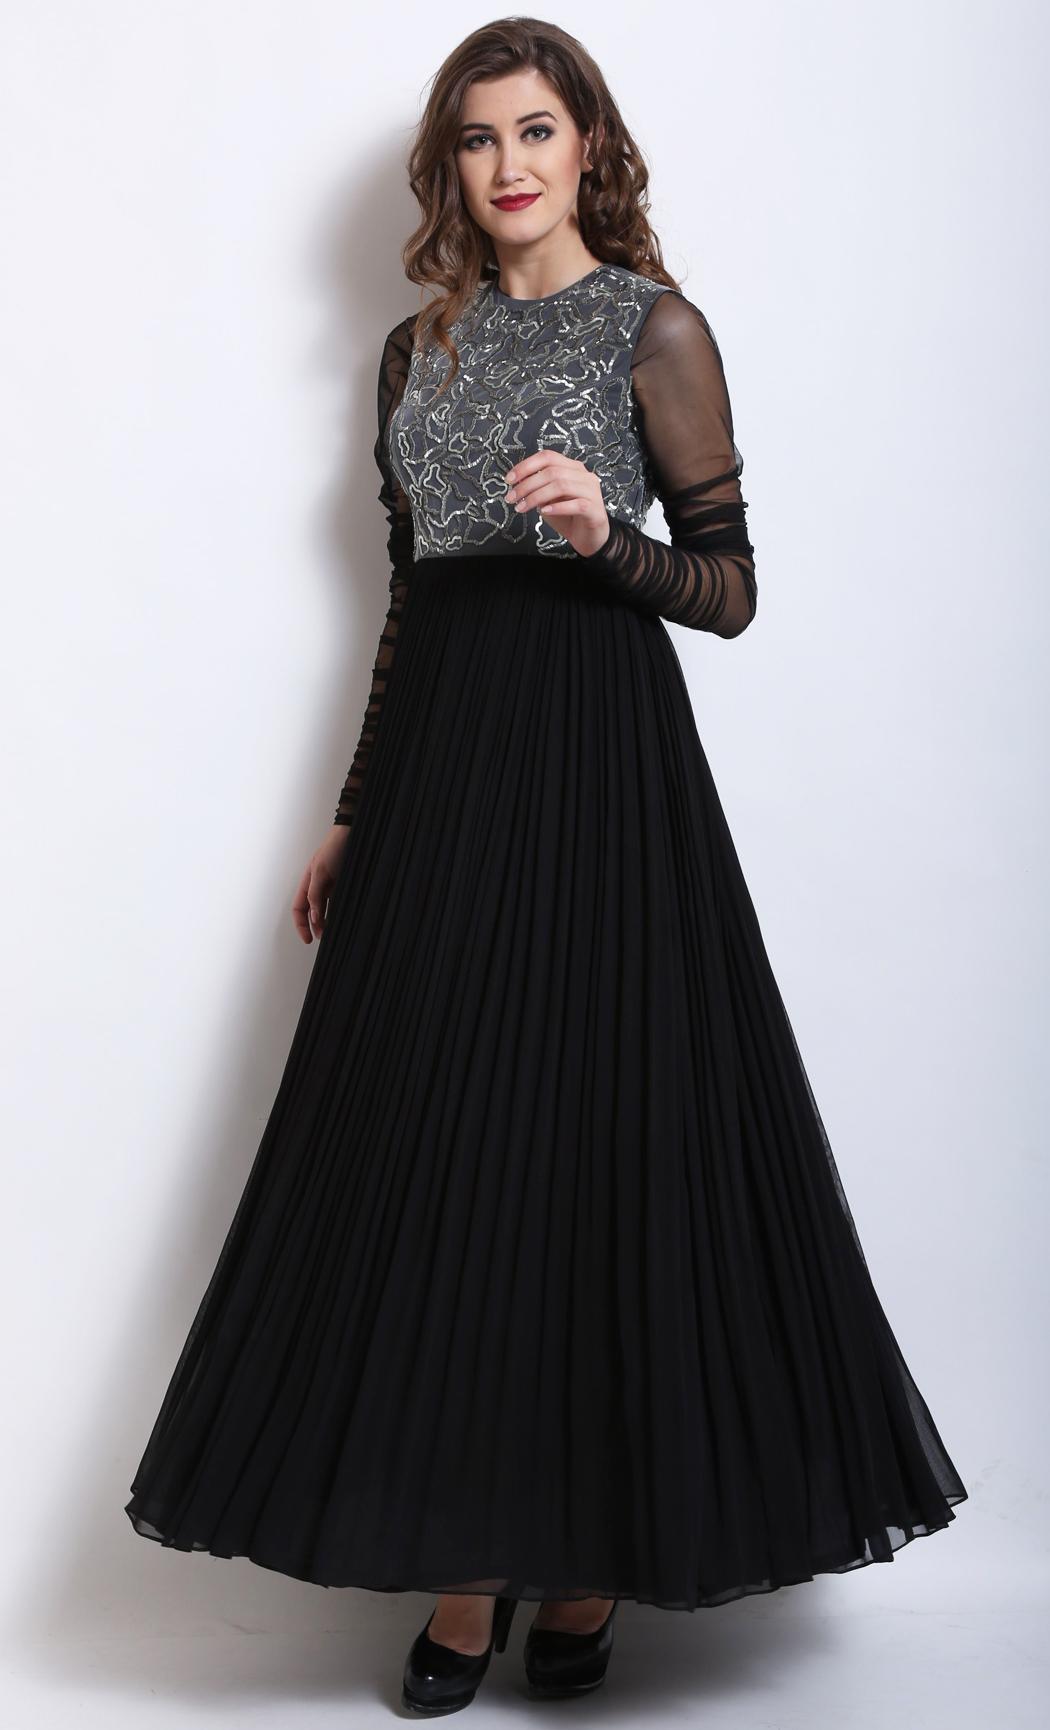 Black and Grey Kurta Gown - Buy Online